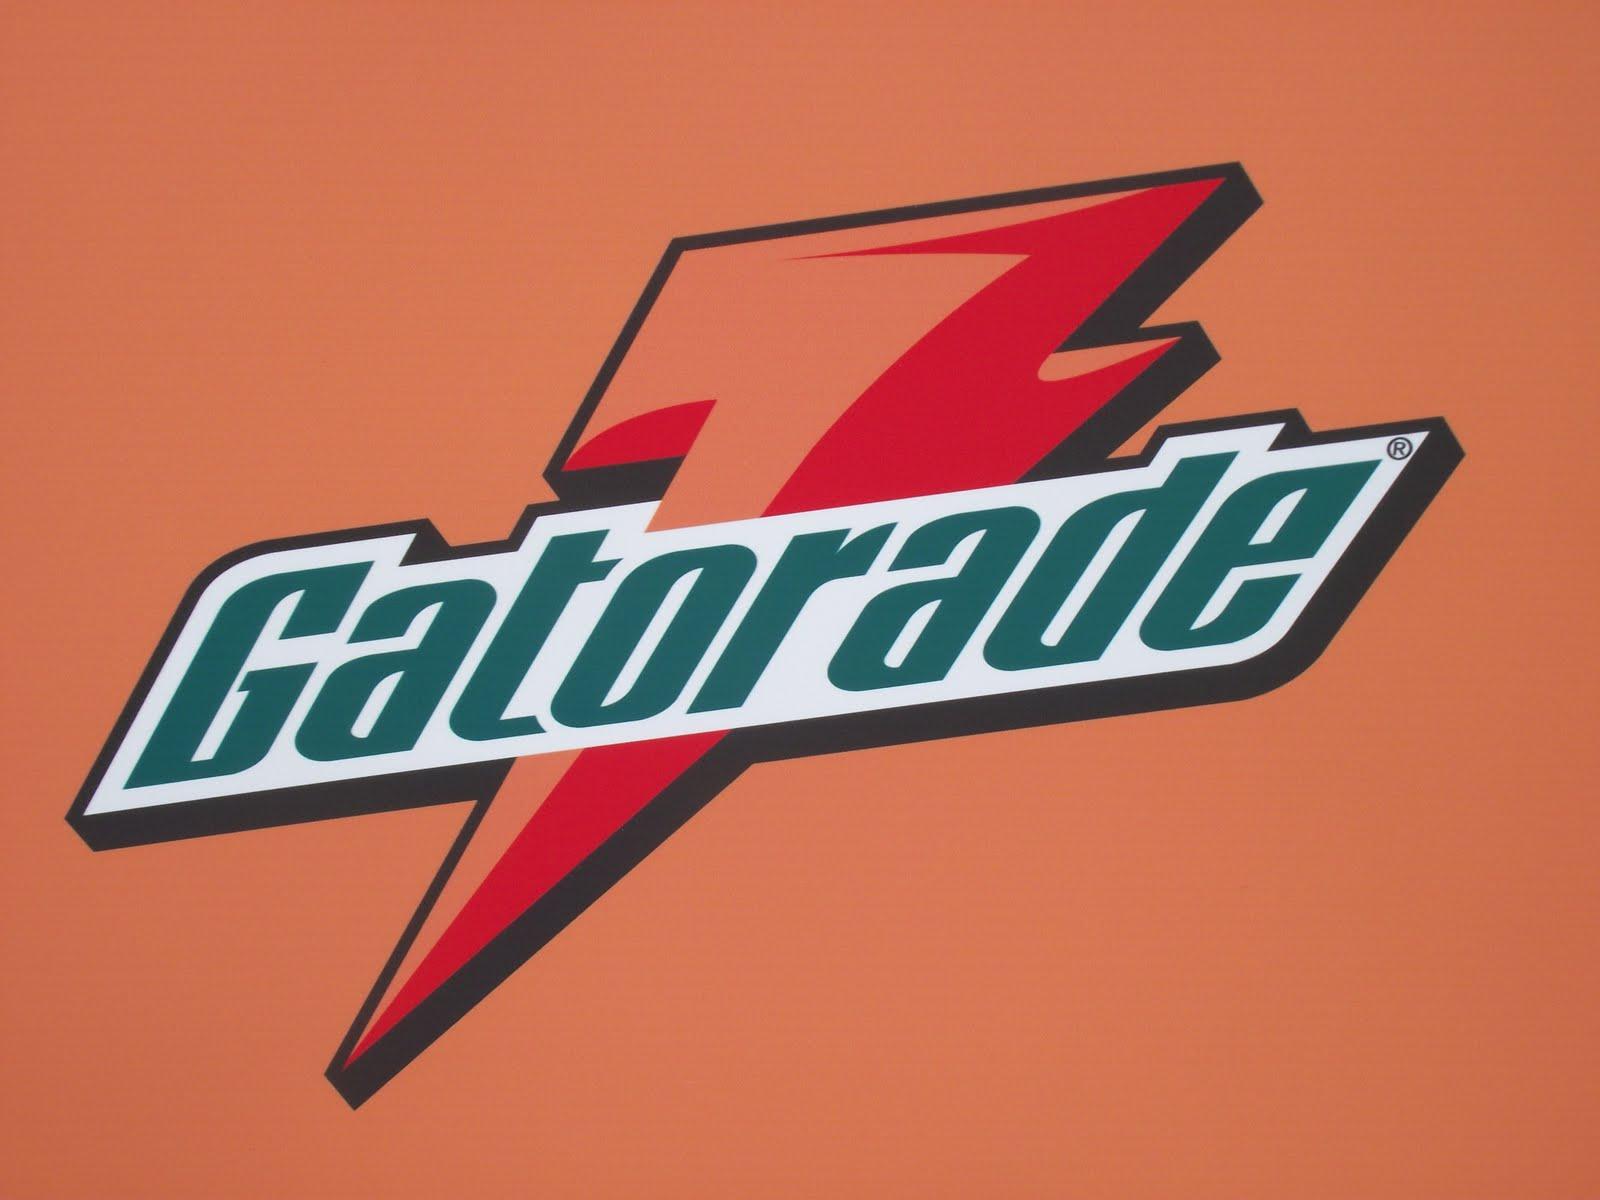 gatorade wallpaper - photo #4